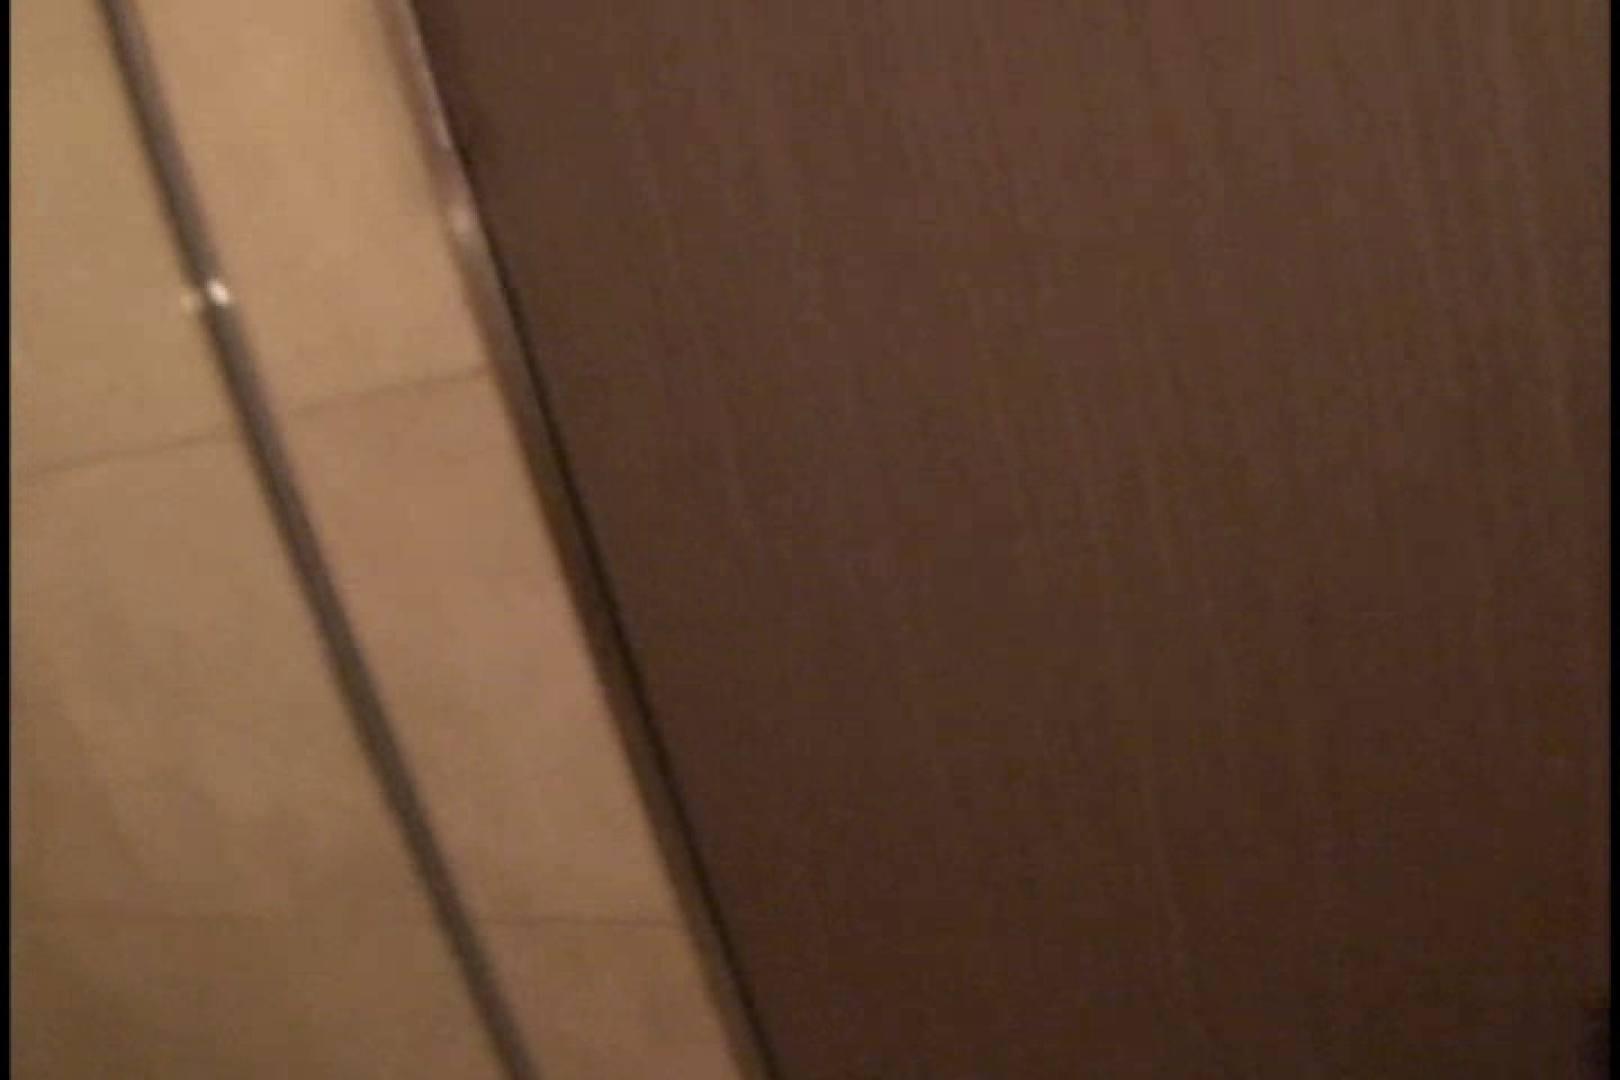 JDハンター全国ツアー vol.031 前編 女子大生のエロ動画 | 0  97PIX 83